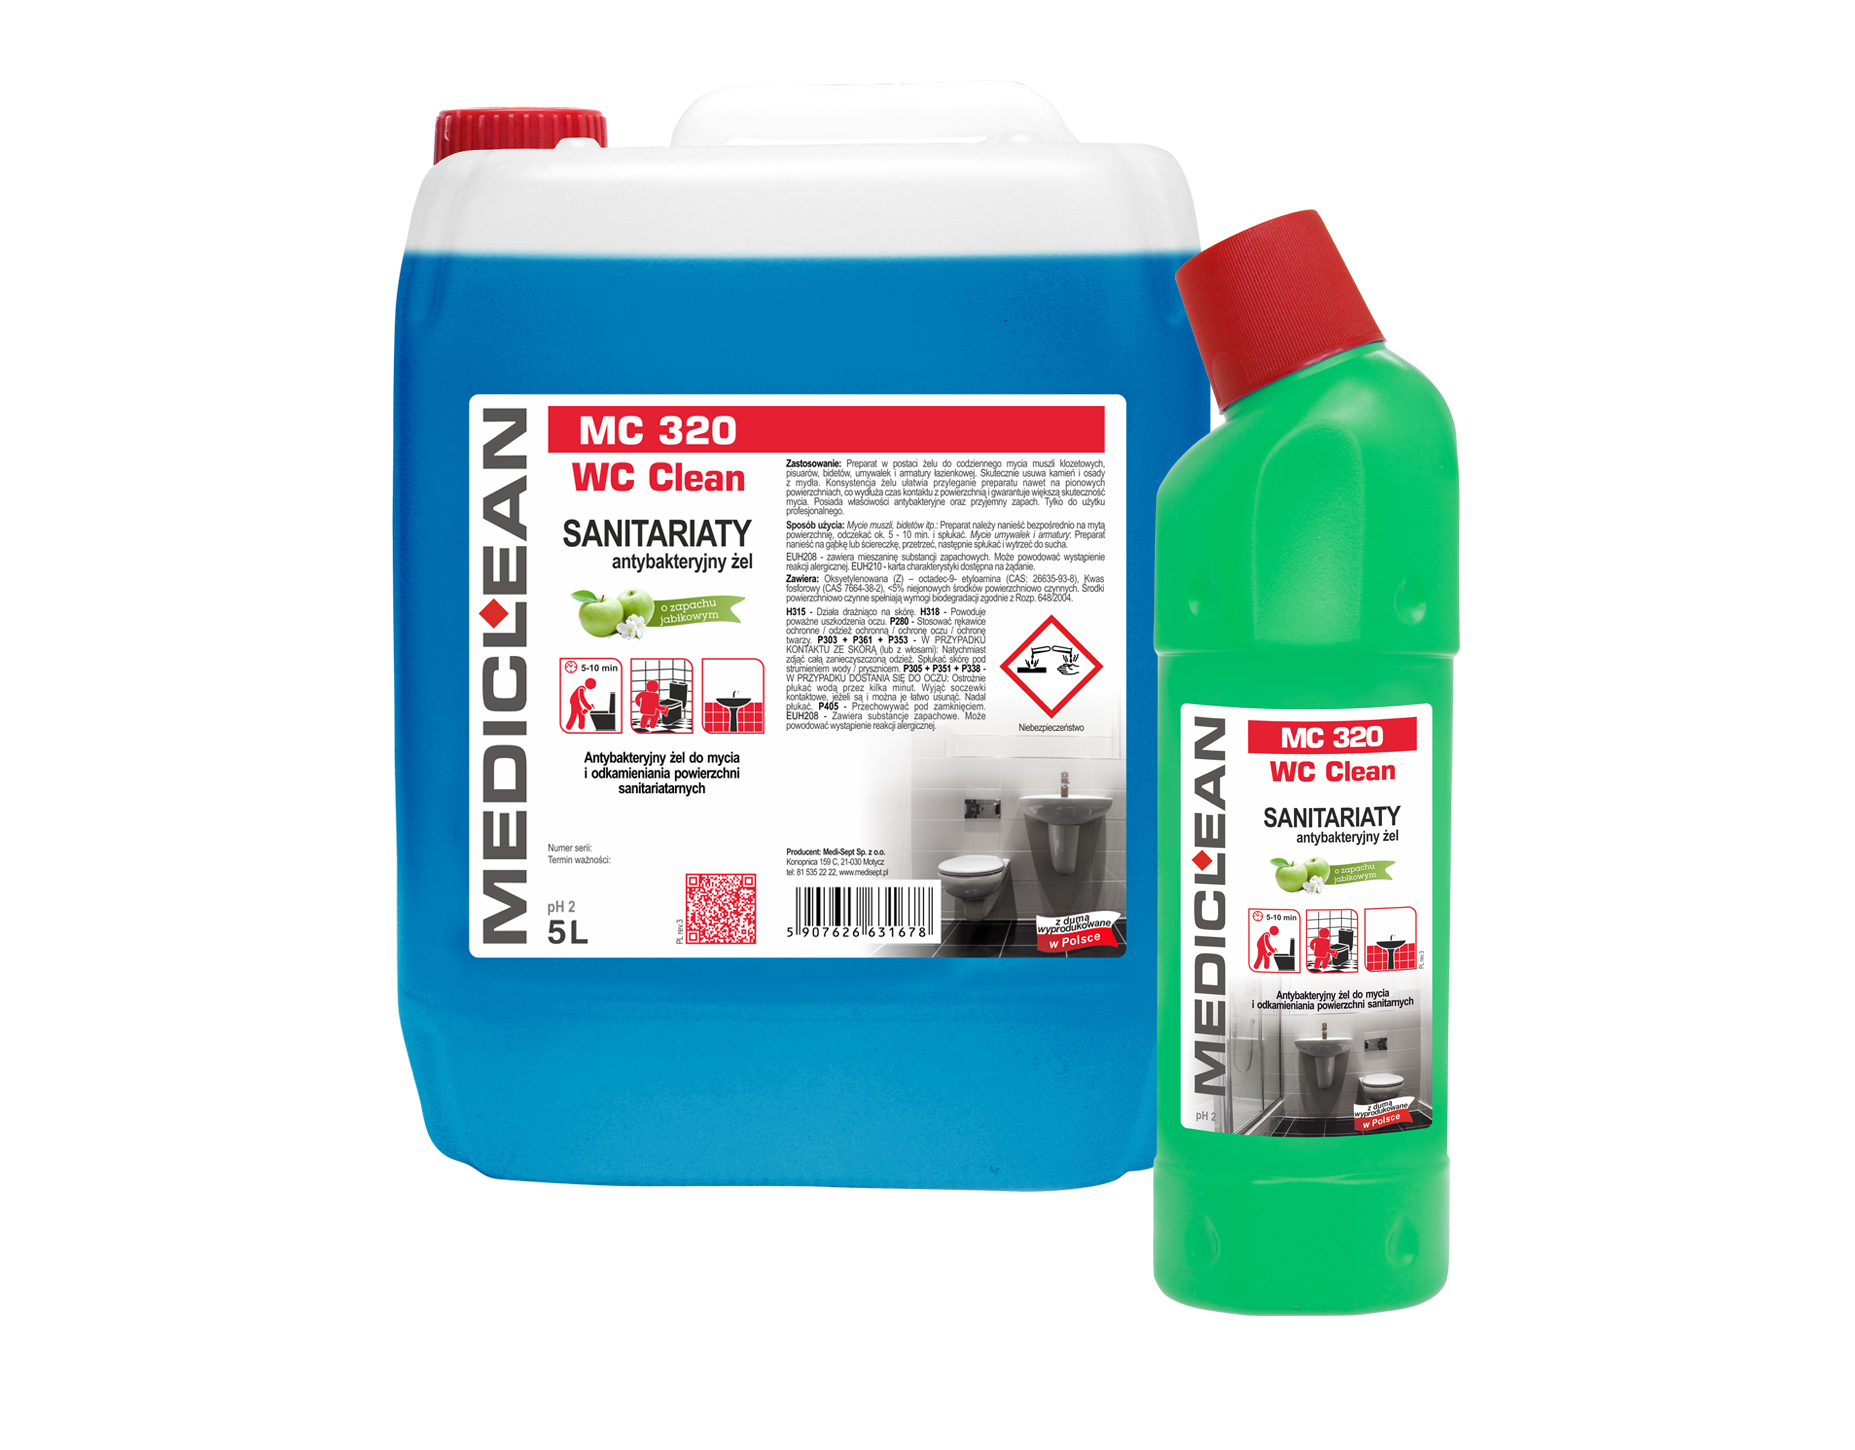 Mediclean MC 320 WC Clean